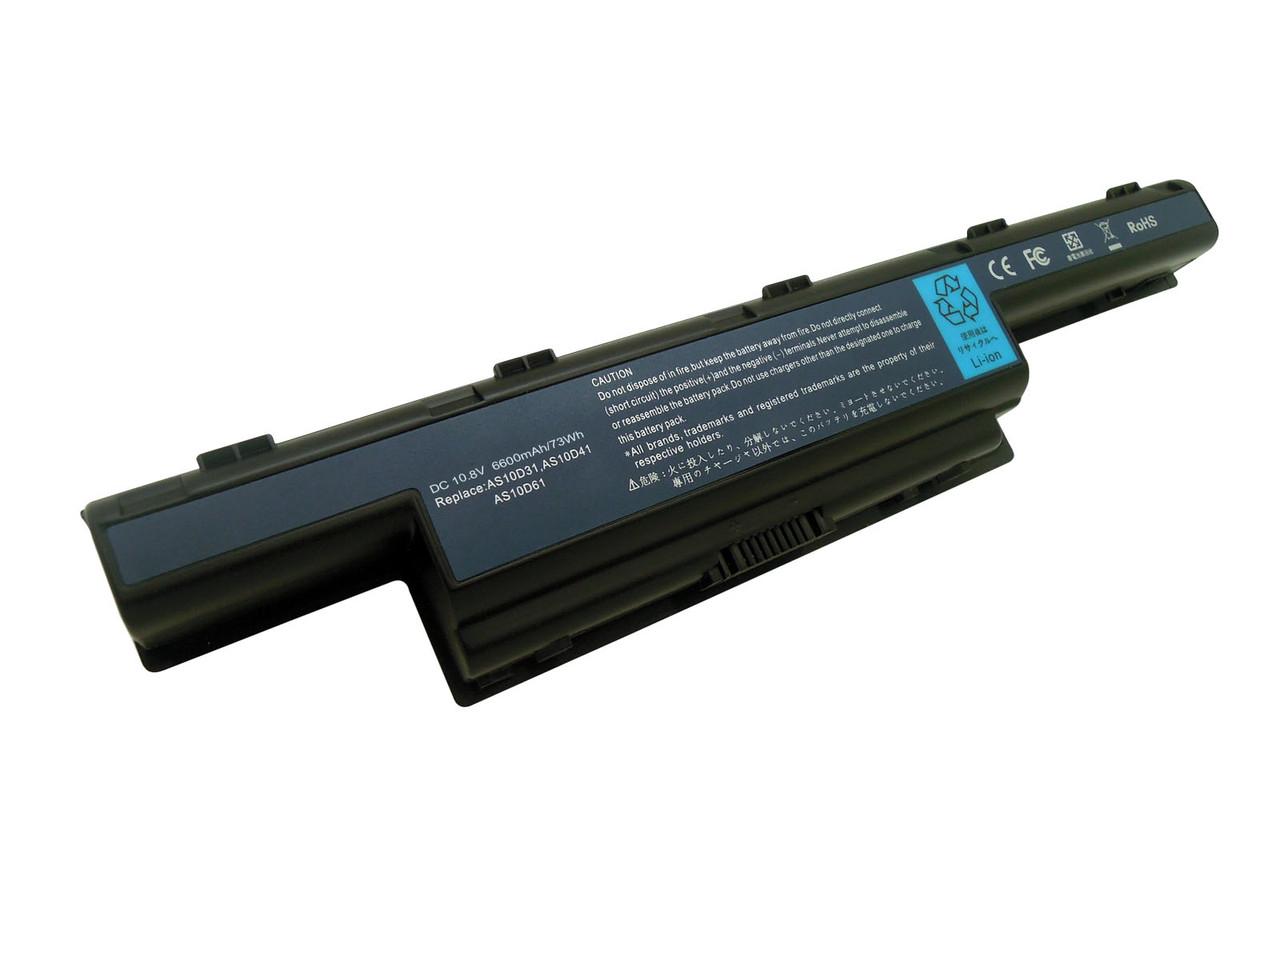 Аккумулятор для ноутбука ACER Aspire 5336-901G25Mncc